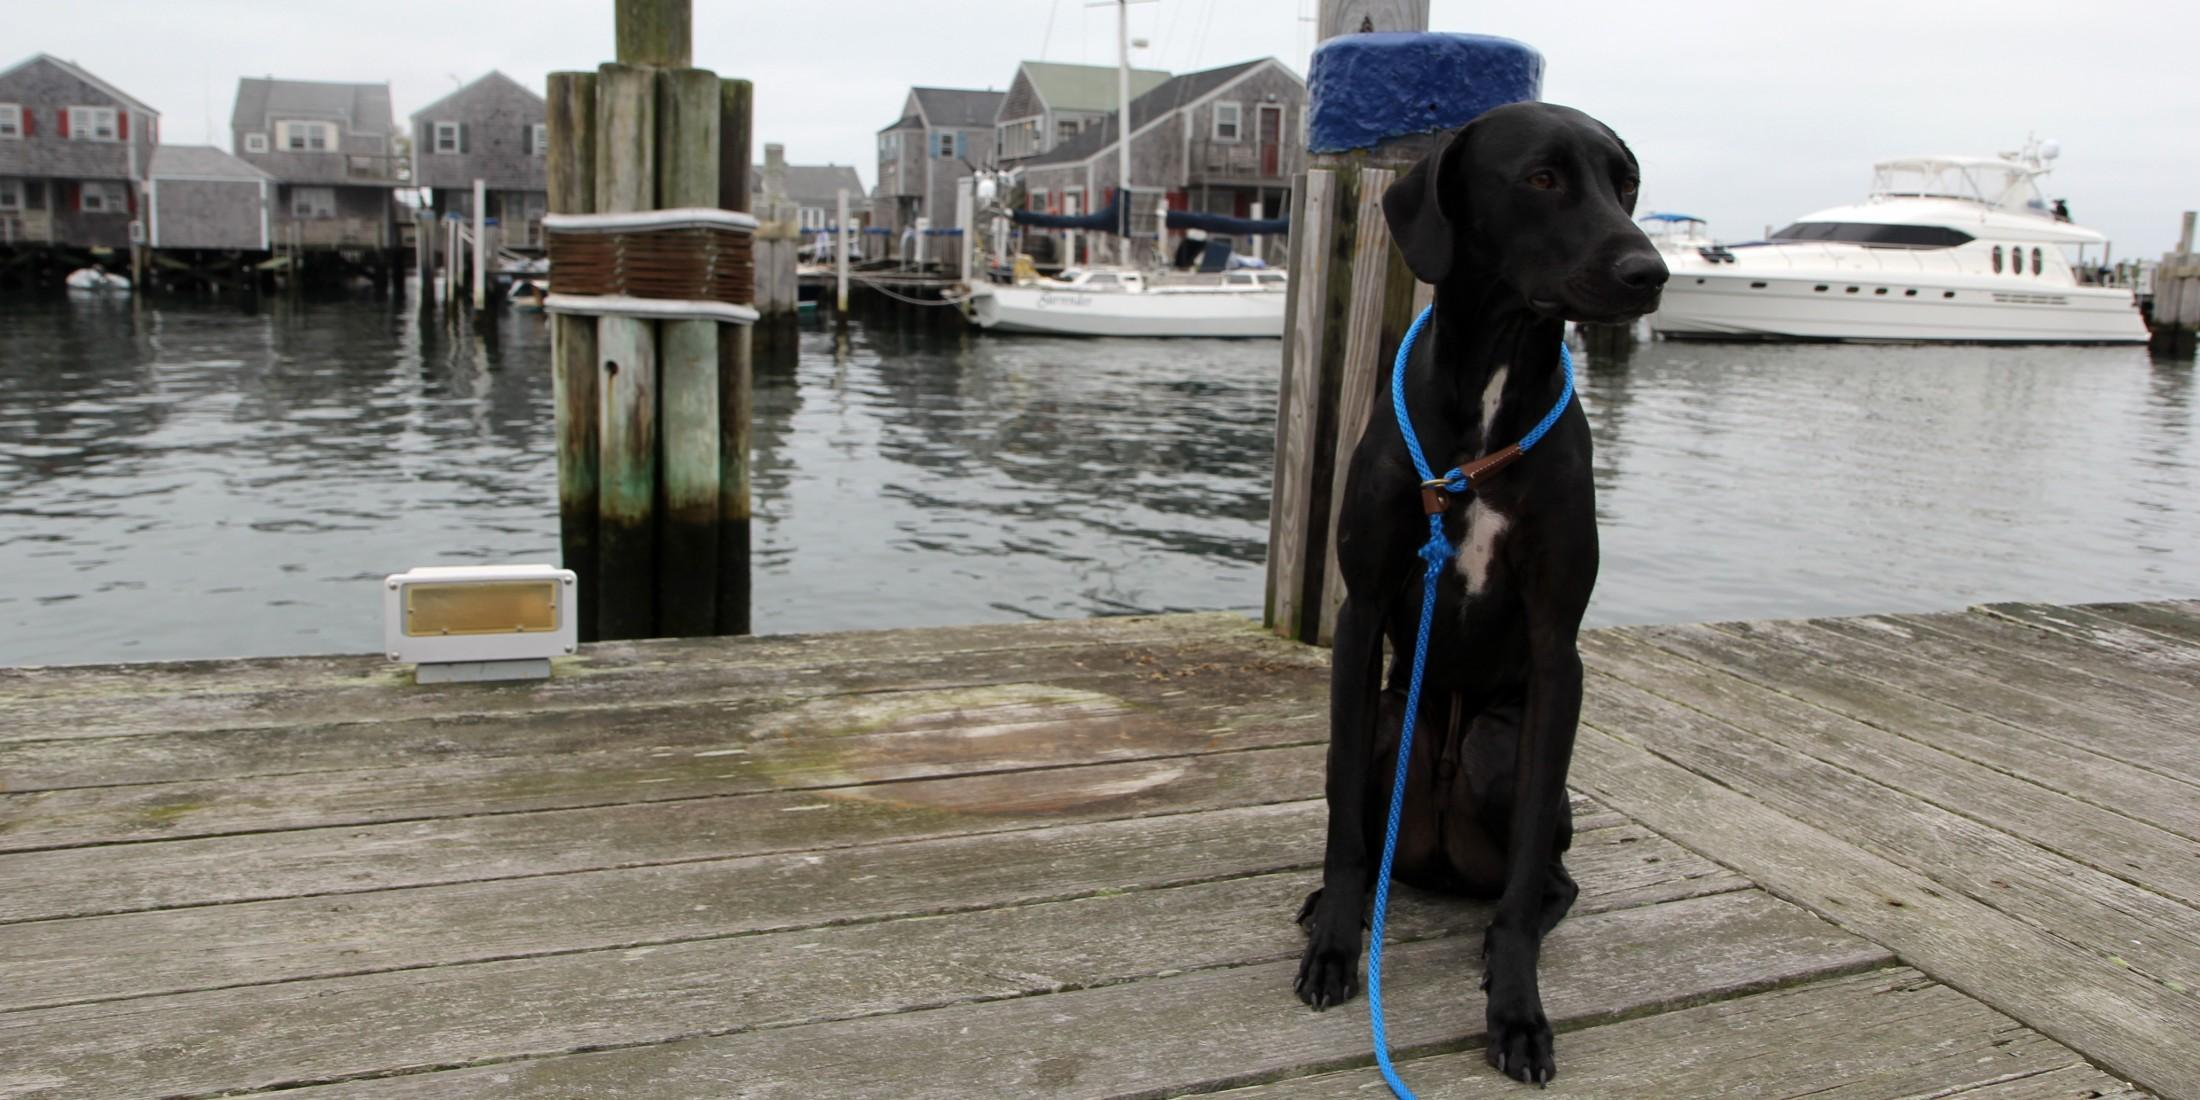 Dog-friendly Nantucket